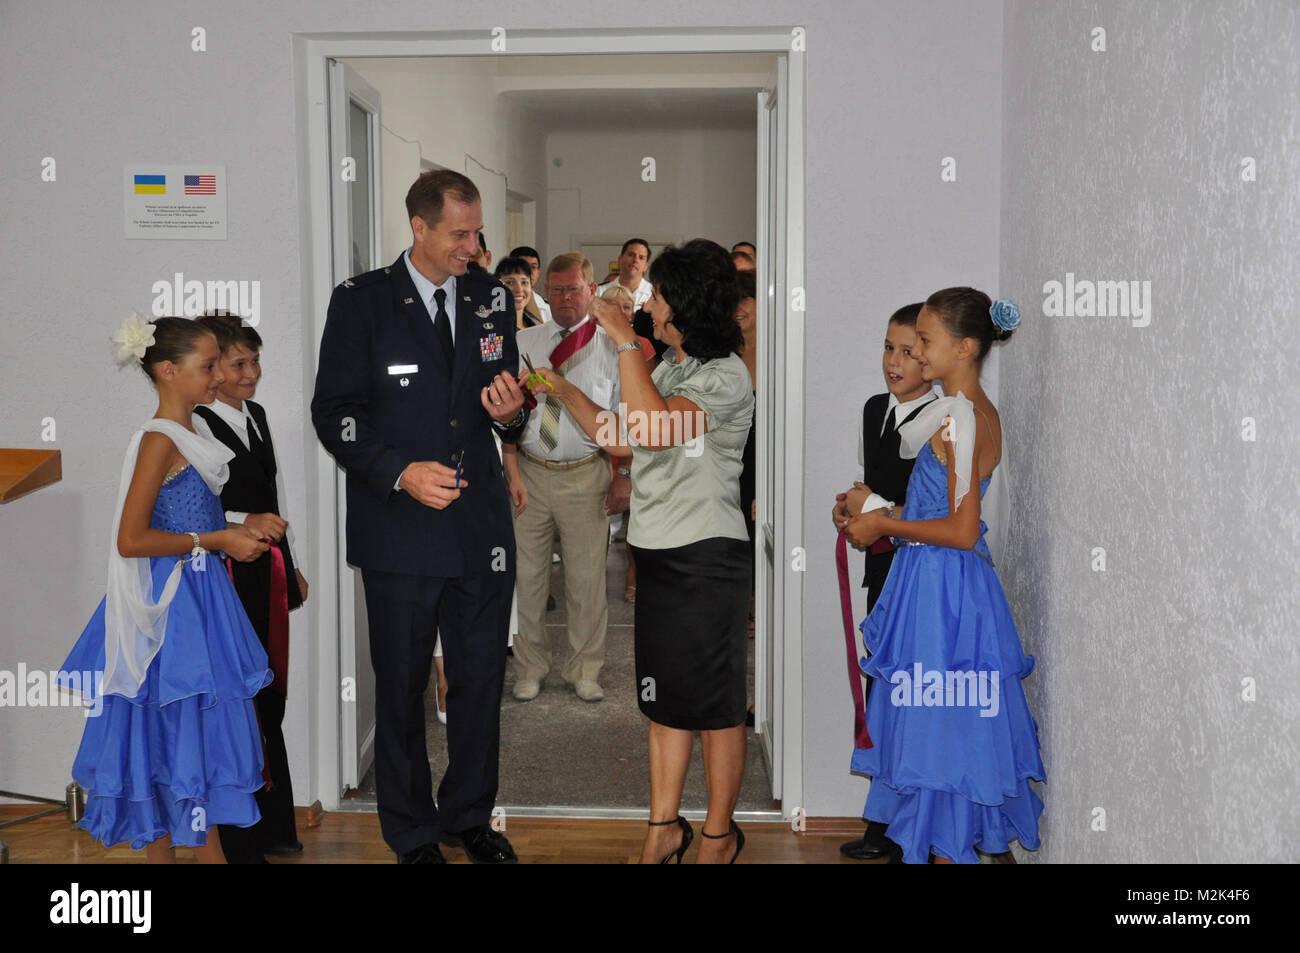 EUCOM assistance in Ukranian school renovation by EUCOM - Stock Image